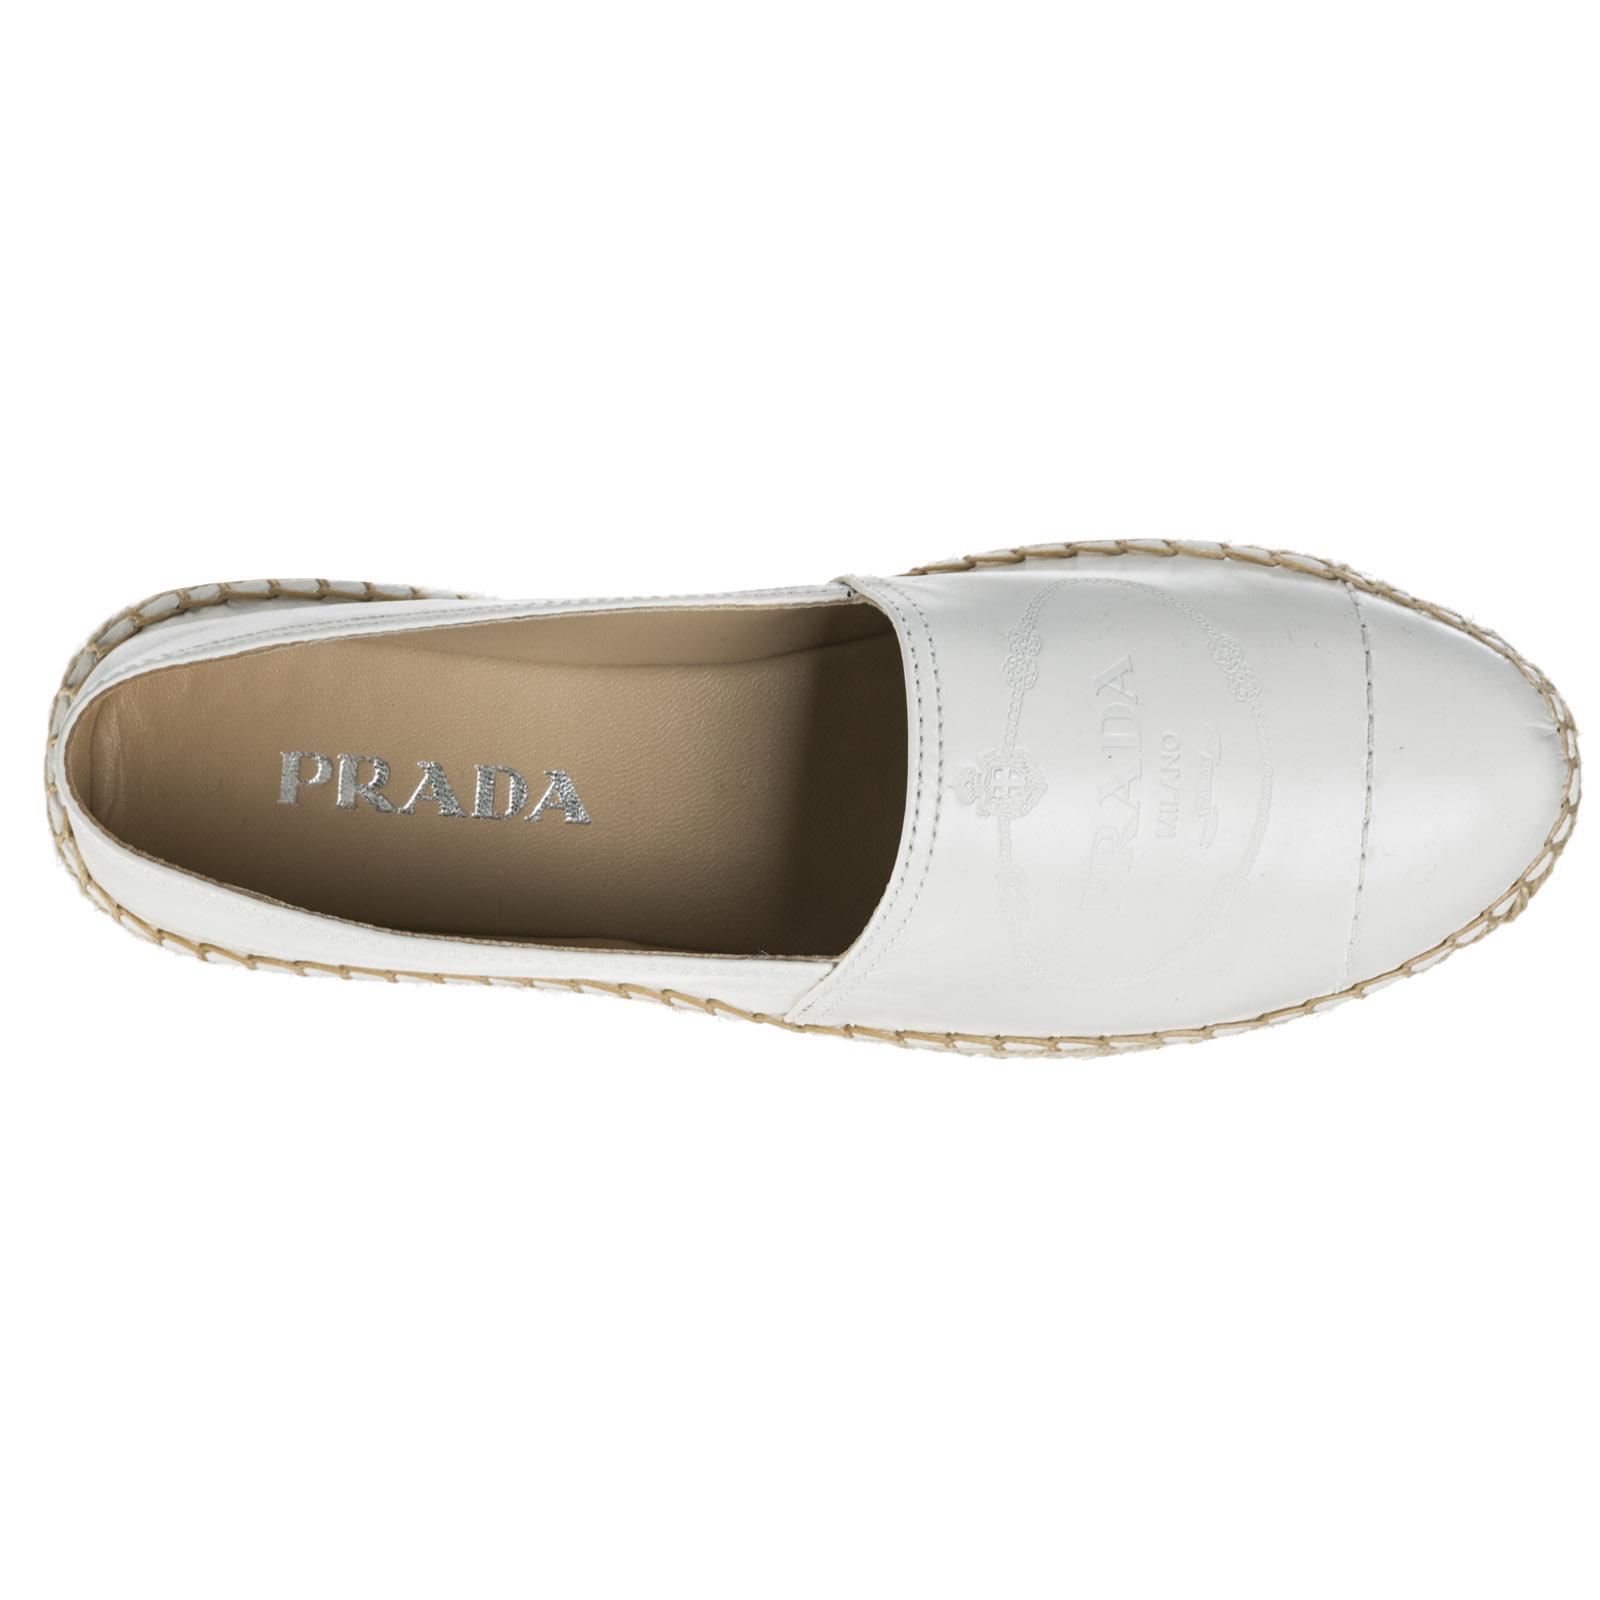 Women's espadrilles slip on shoes